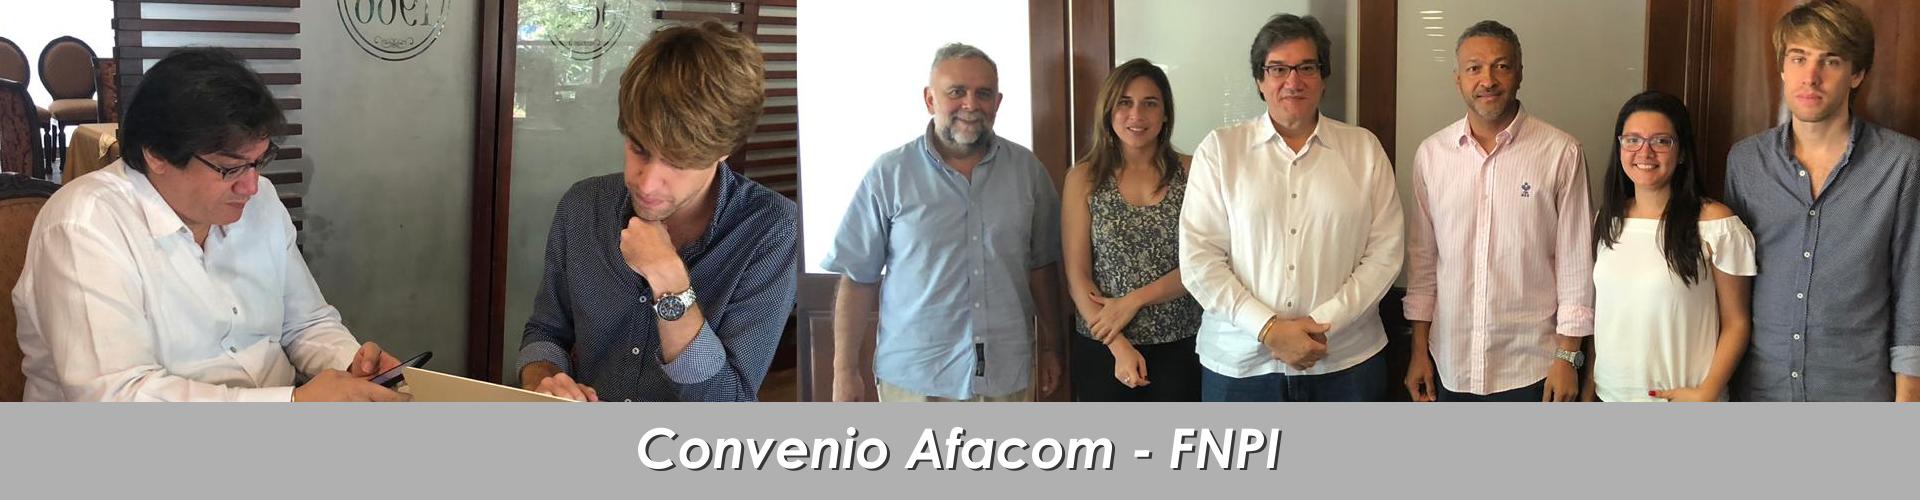 AFACOM-FNPII